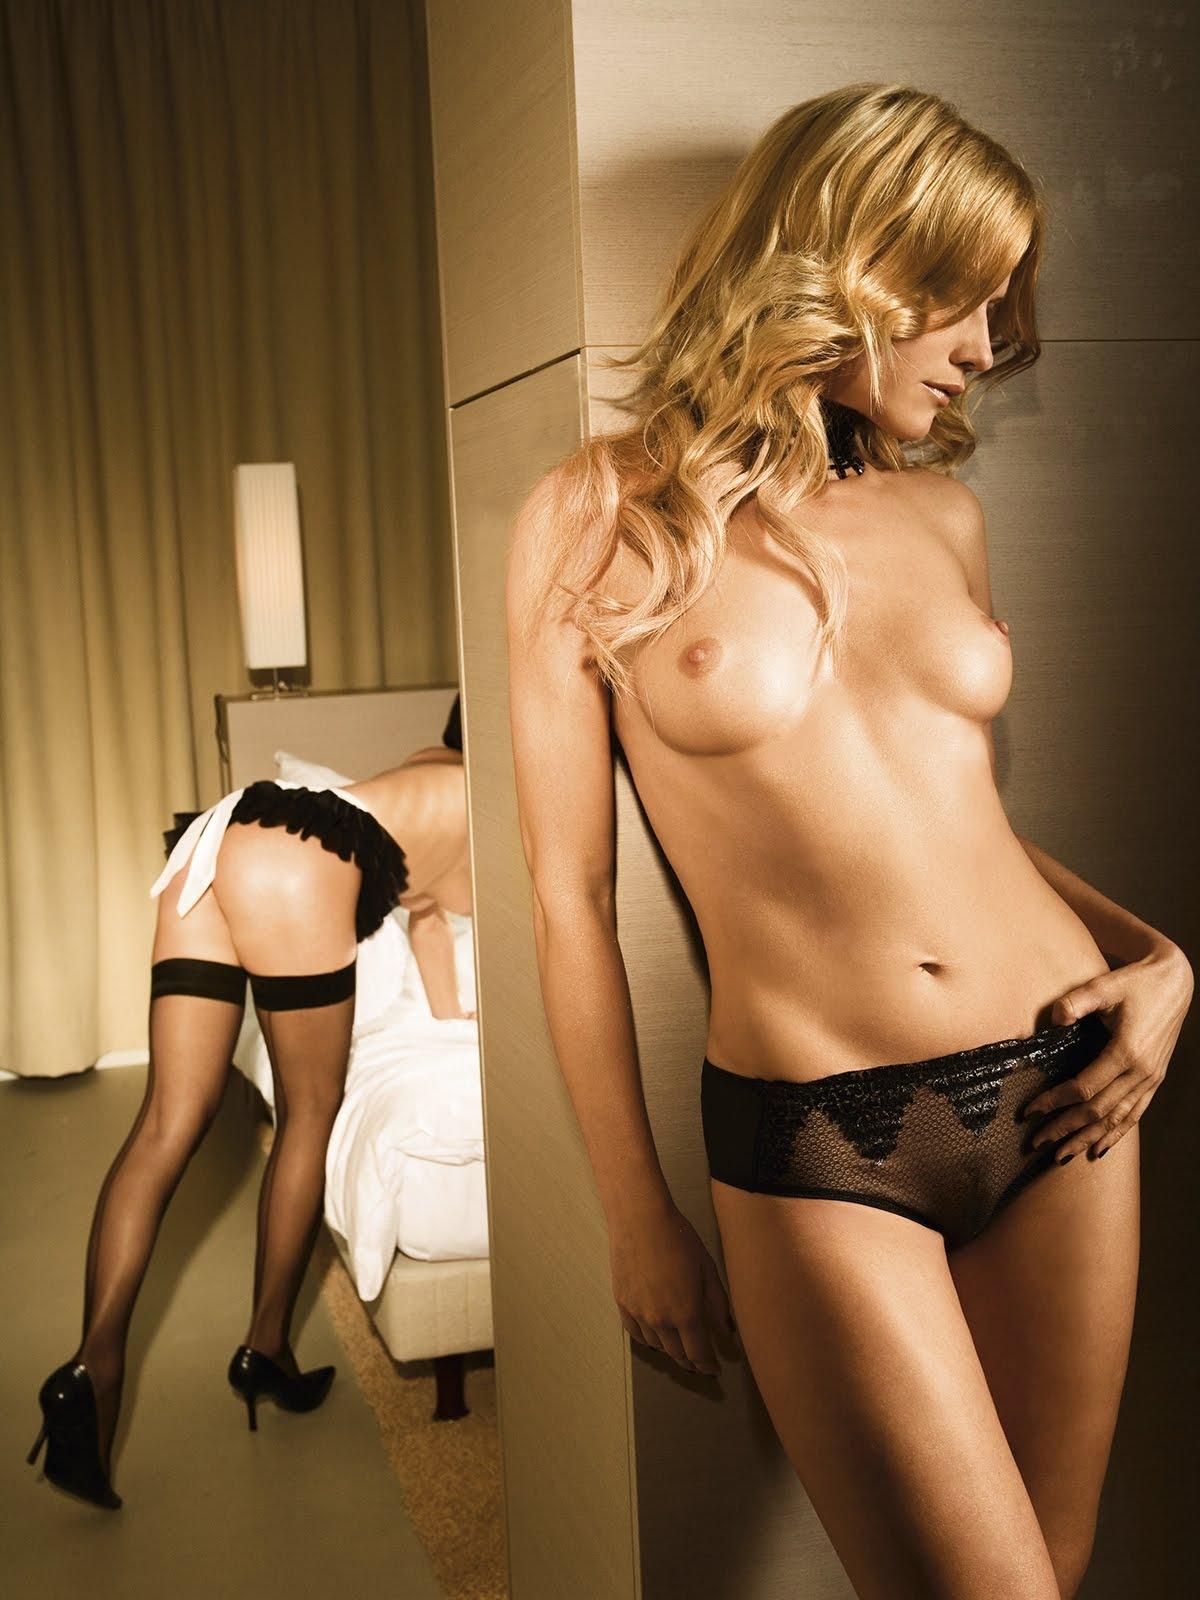 http://3.bp.blogspot.com/_PN9Kbmw_Hq8/TCiA09p52fI/AAAAAAAAHgM/t4gyV-ypiOU/s1600/DoreenJacobi.jpg